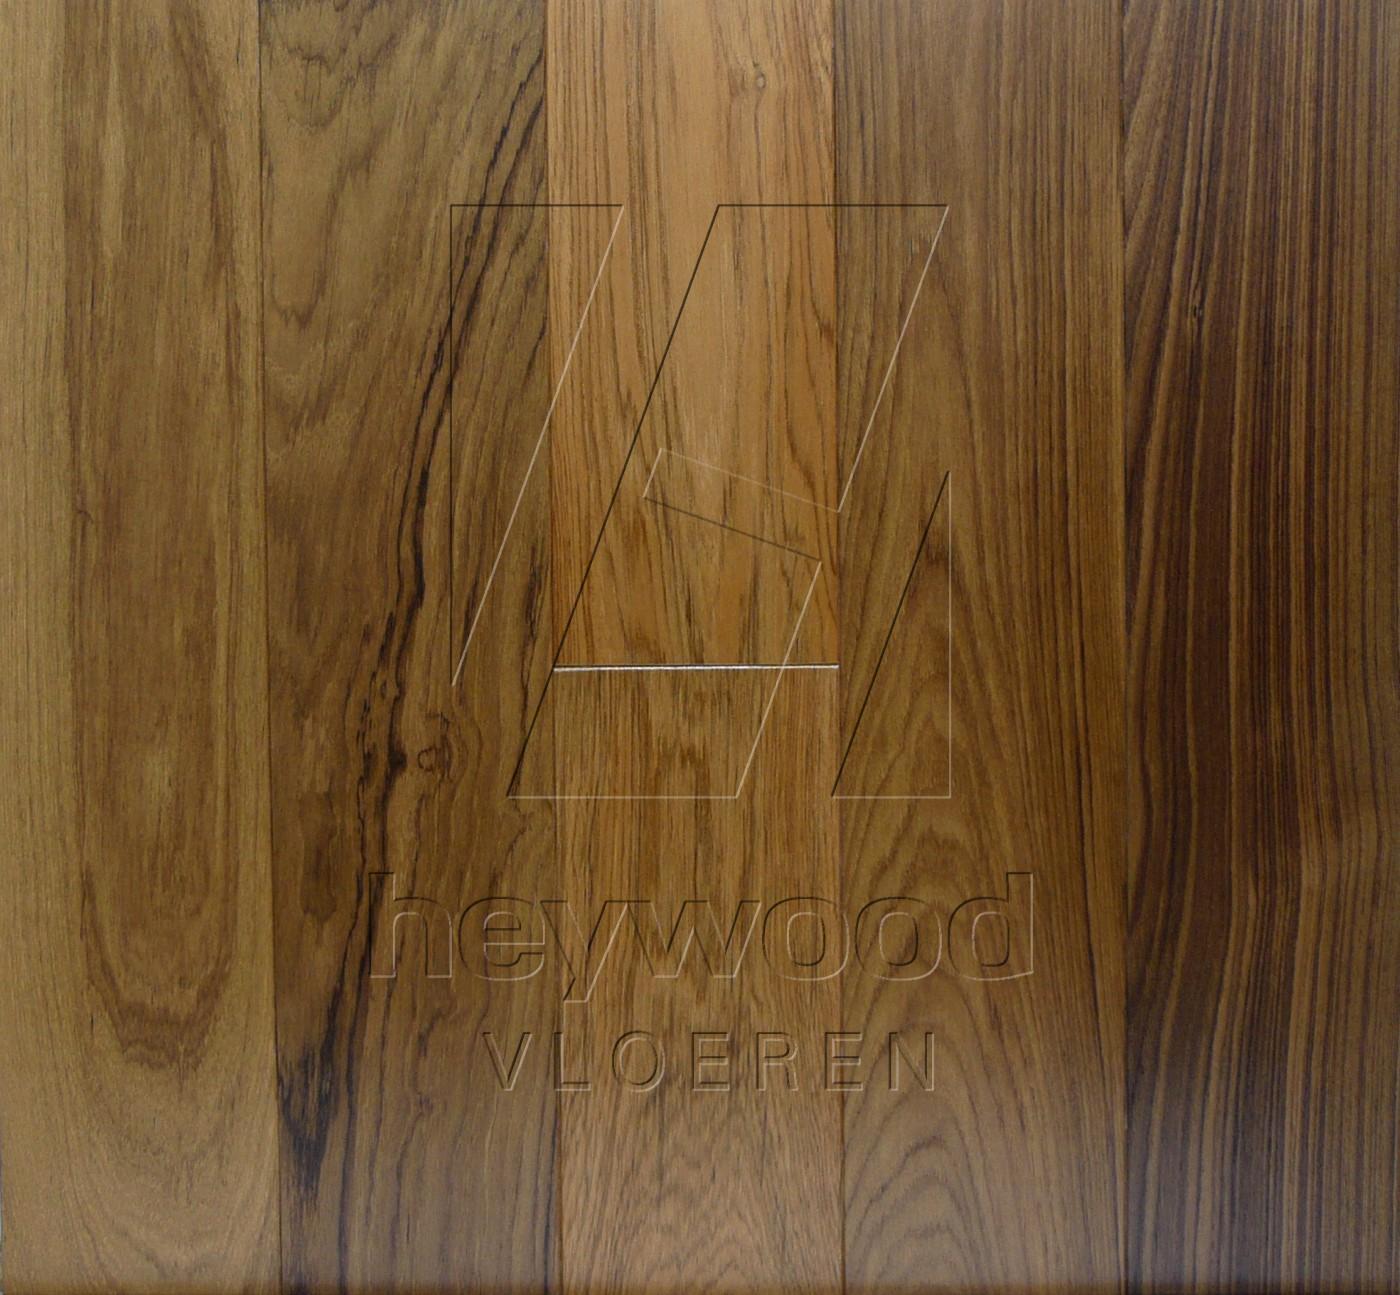 Teak in Other Wood Species of Bespoke Wooden Floors